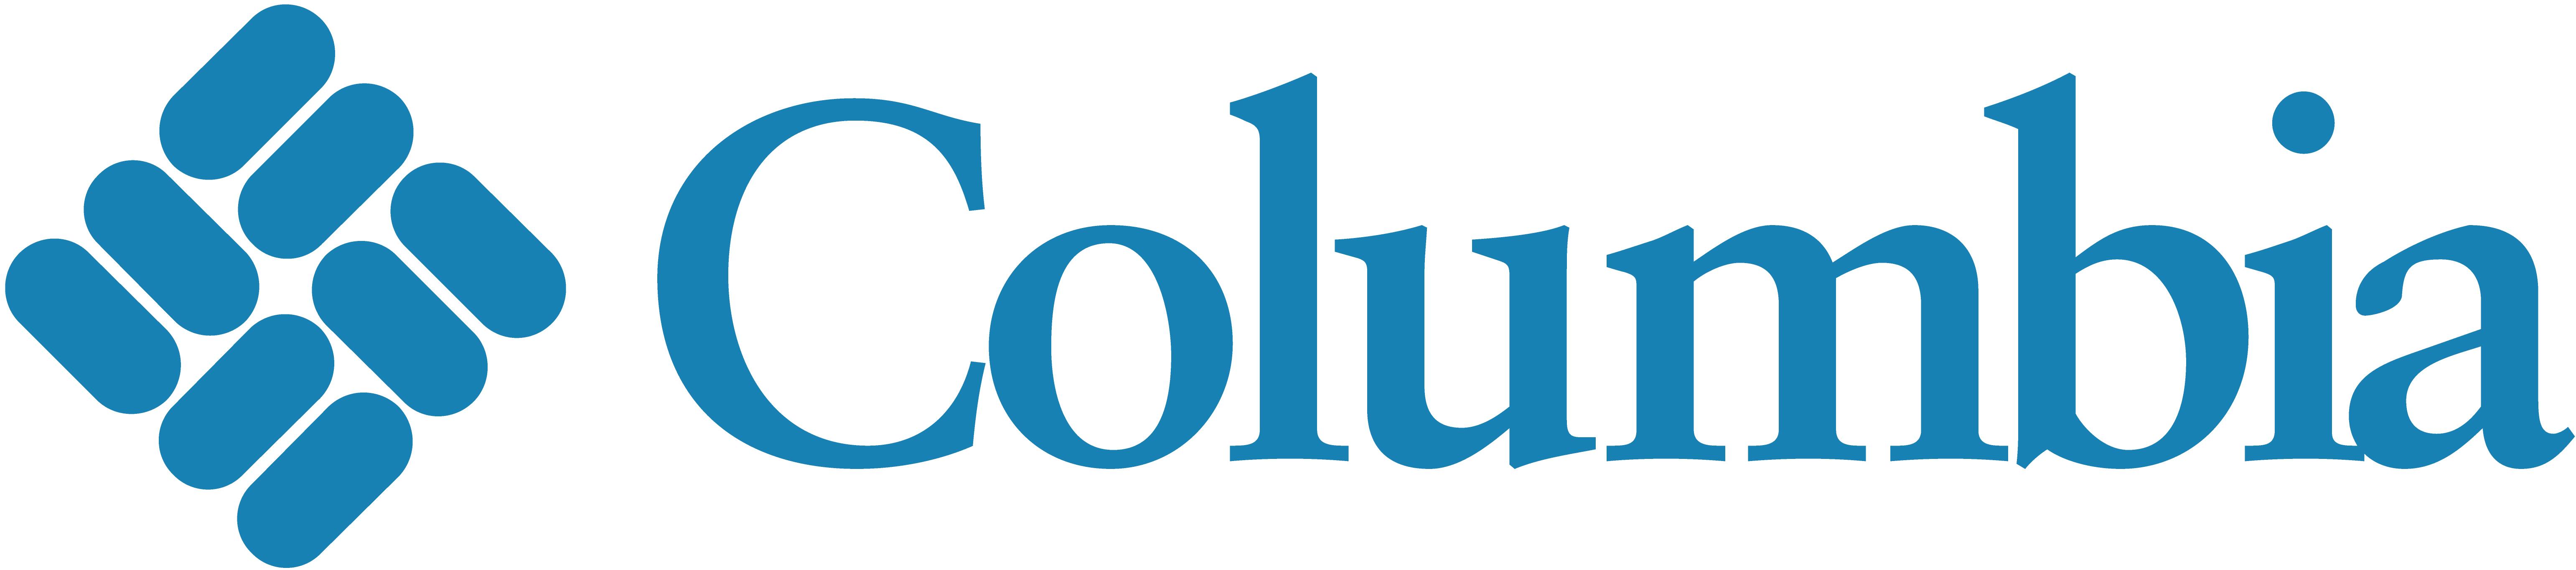 Columbia Logo Brand Wallpaper